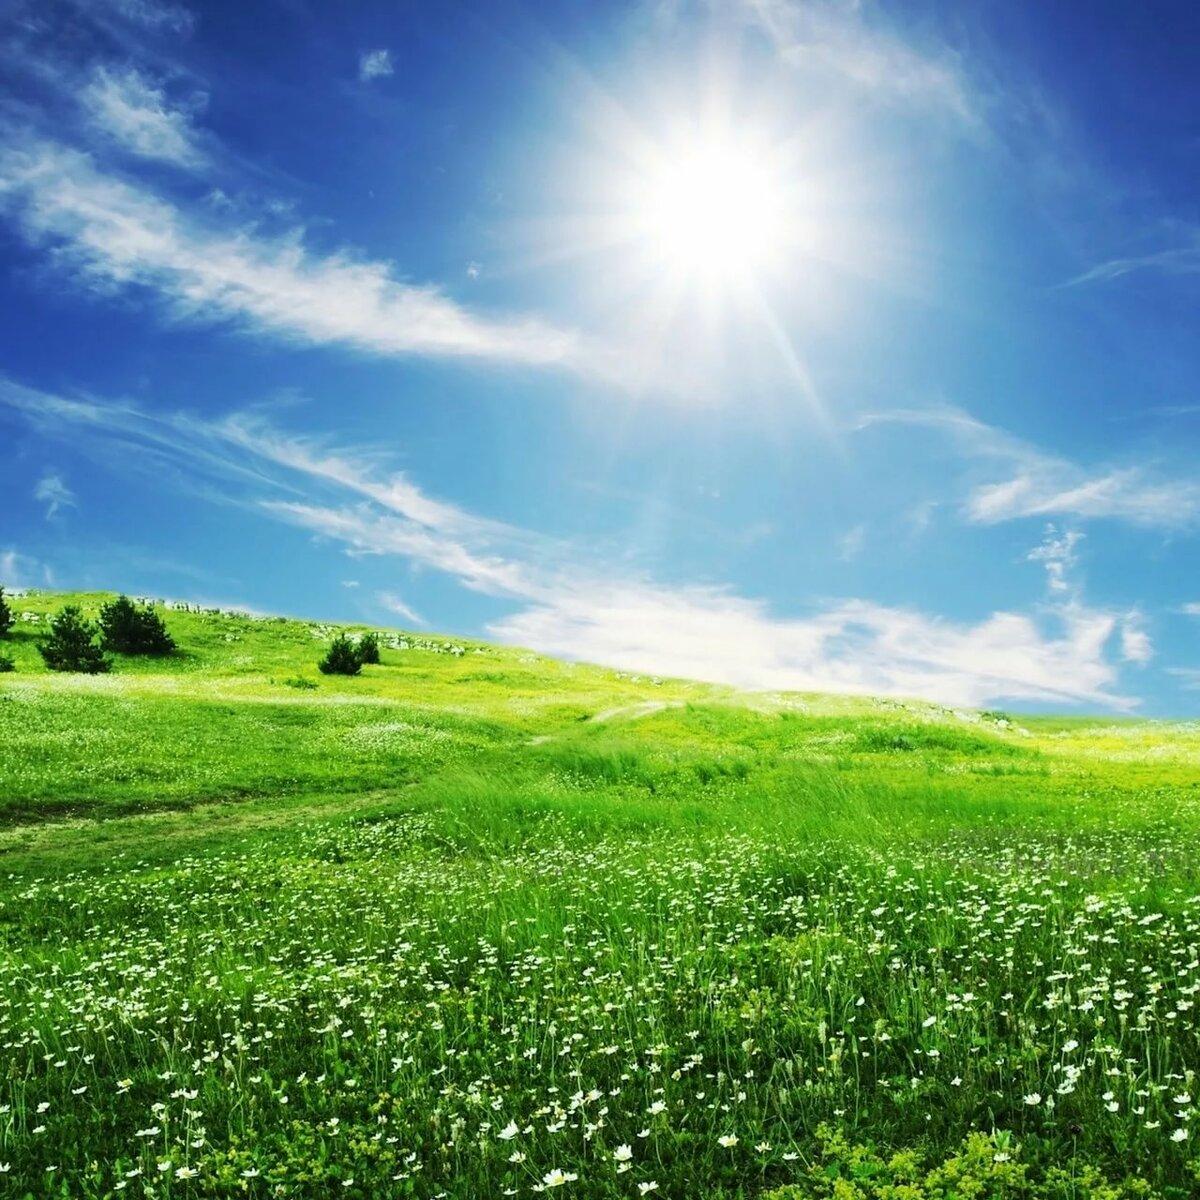 Картинка солнце в природе